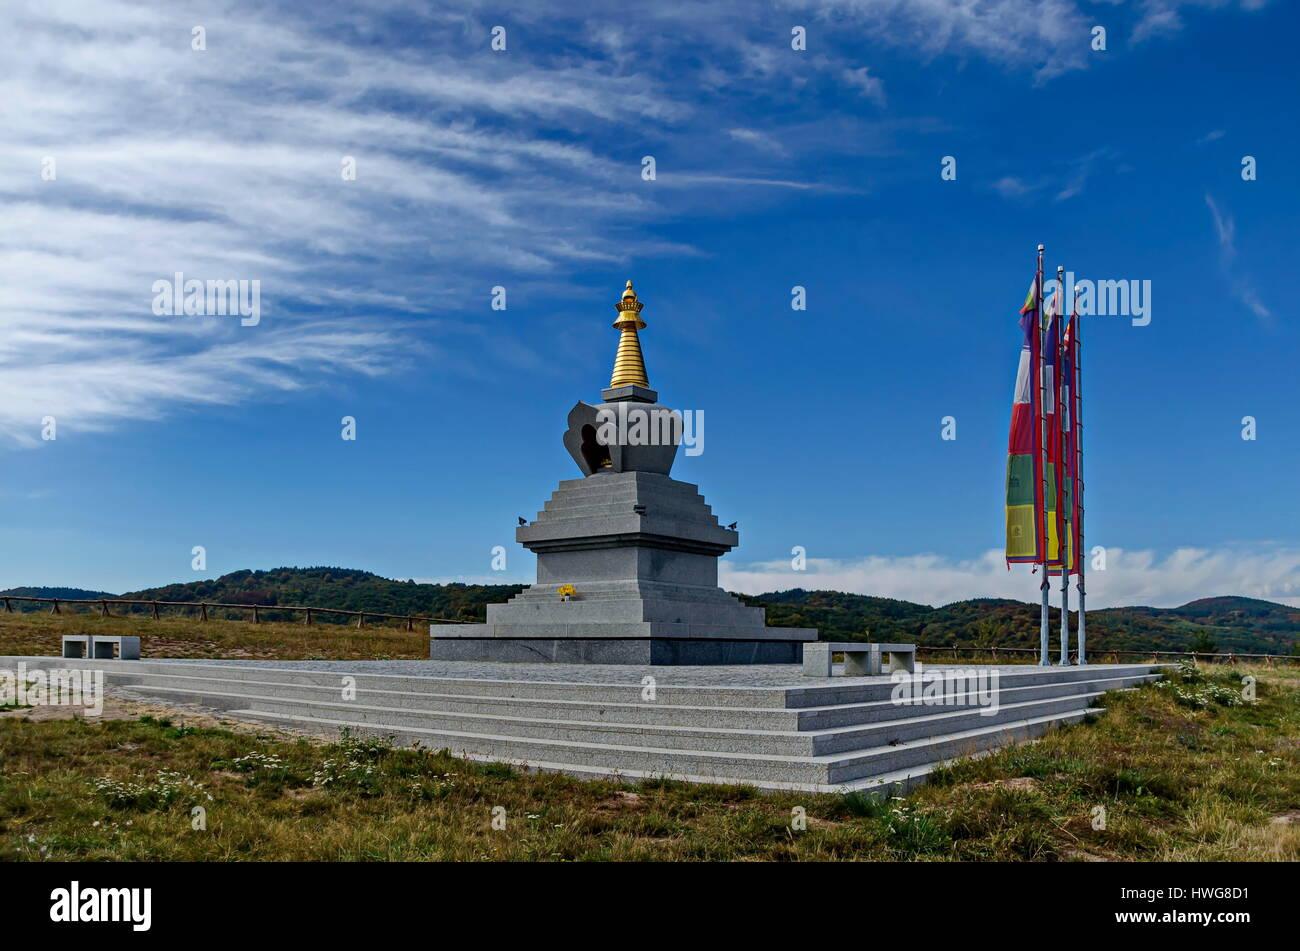 View of Buddhist stupa Sofia in the Retreat Center Plana - Diamondway Buddhism Bulgaria - Stock Image